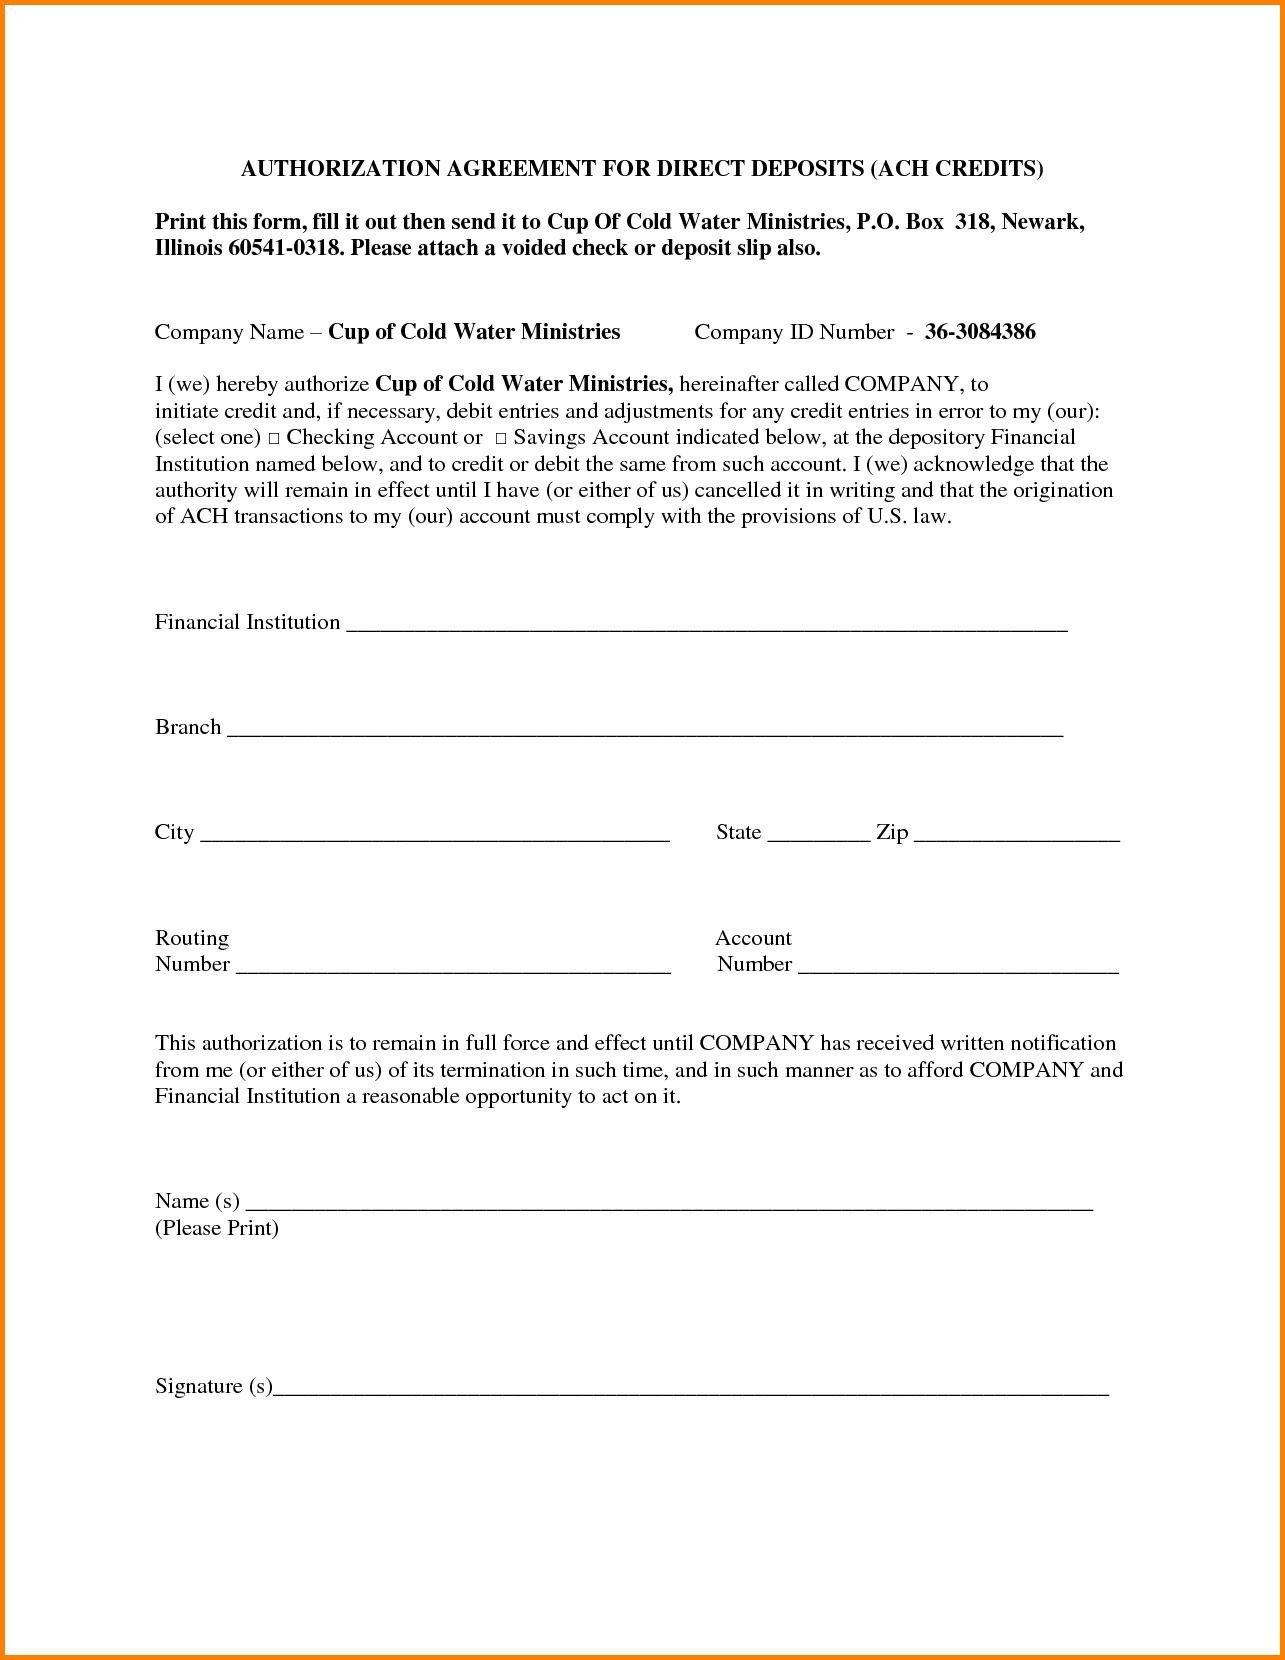 Wells Fargo Affidavit Of Domicile Ach Authorization form Wells Fargo